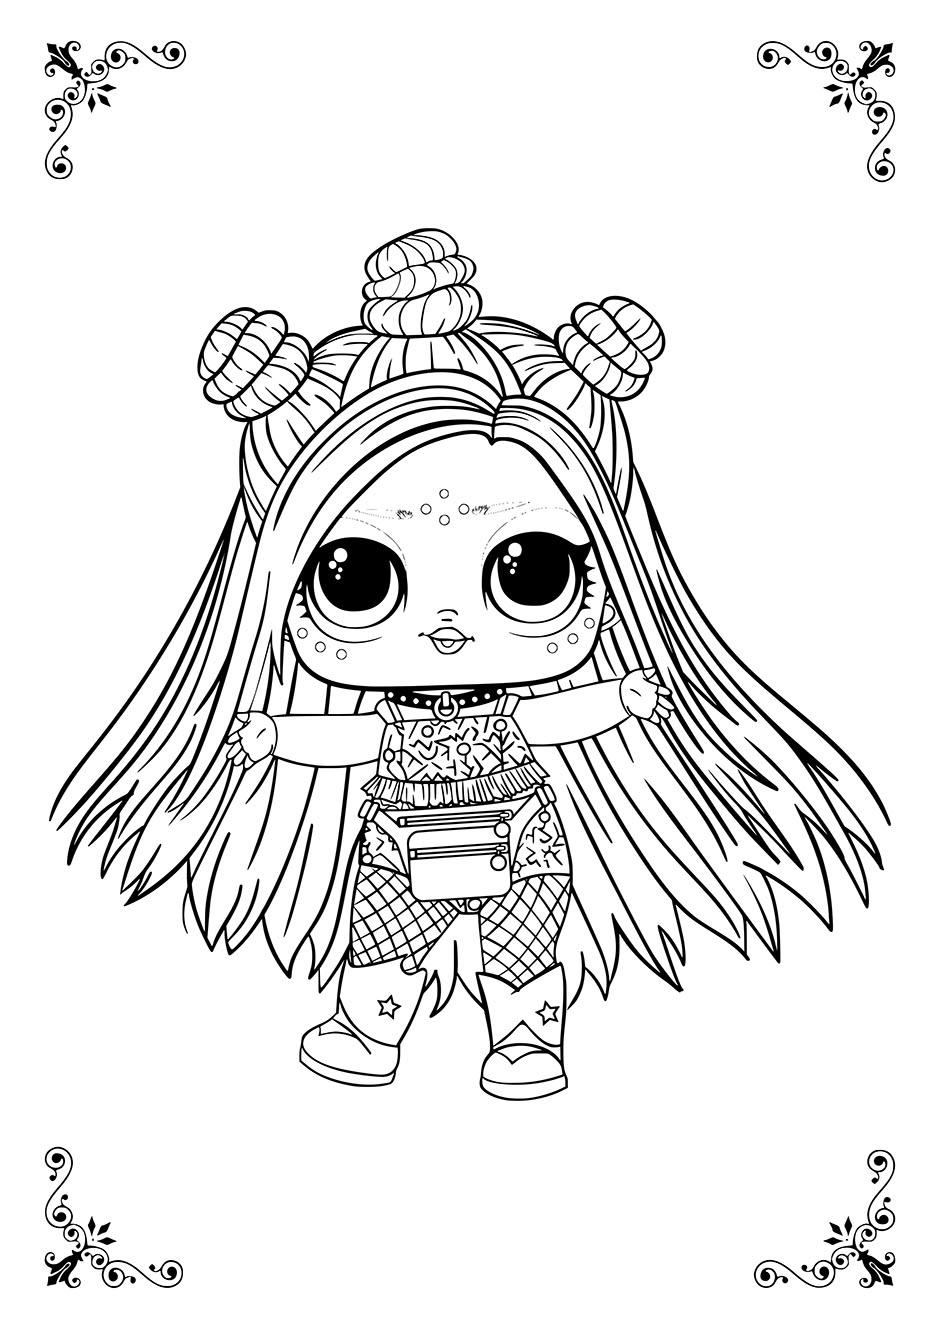 Раскраска: кукла ЛОЛ с гульками — raskraski-a4.ru